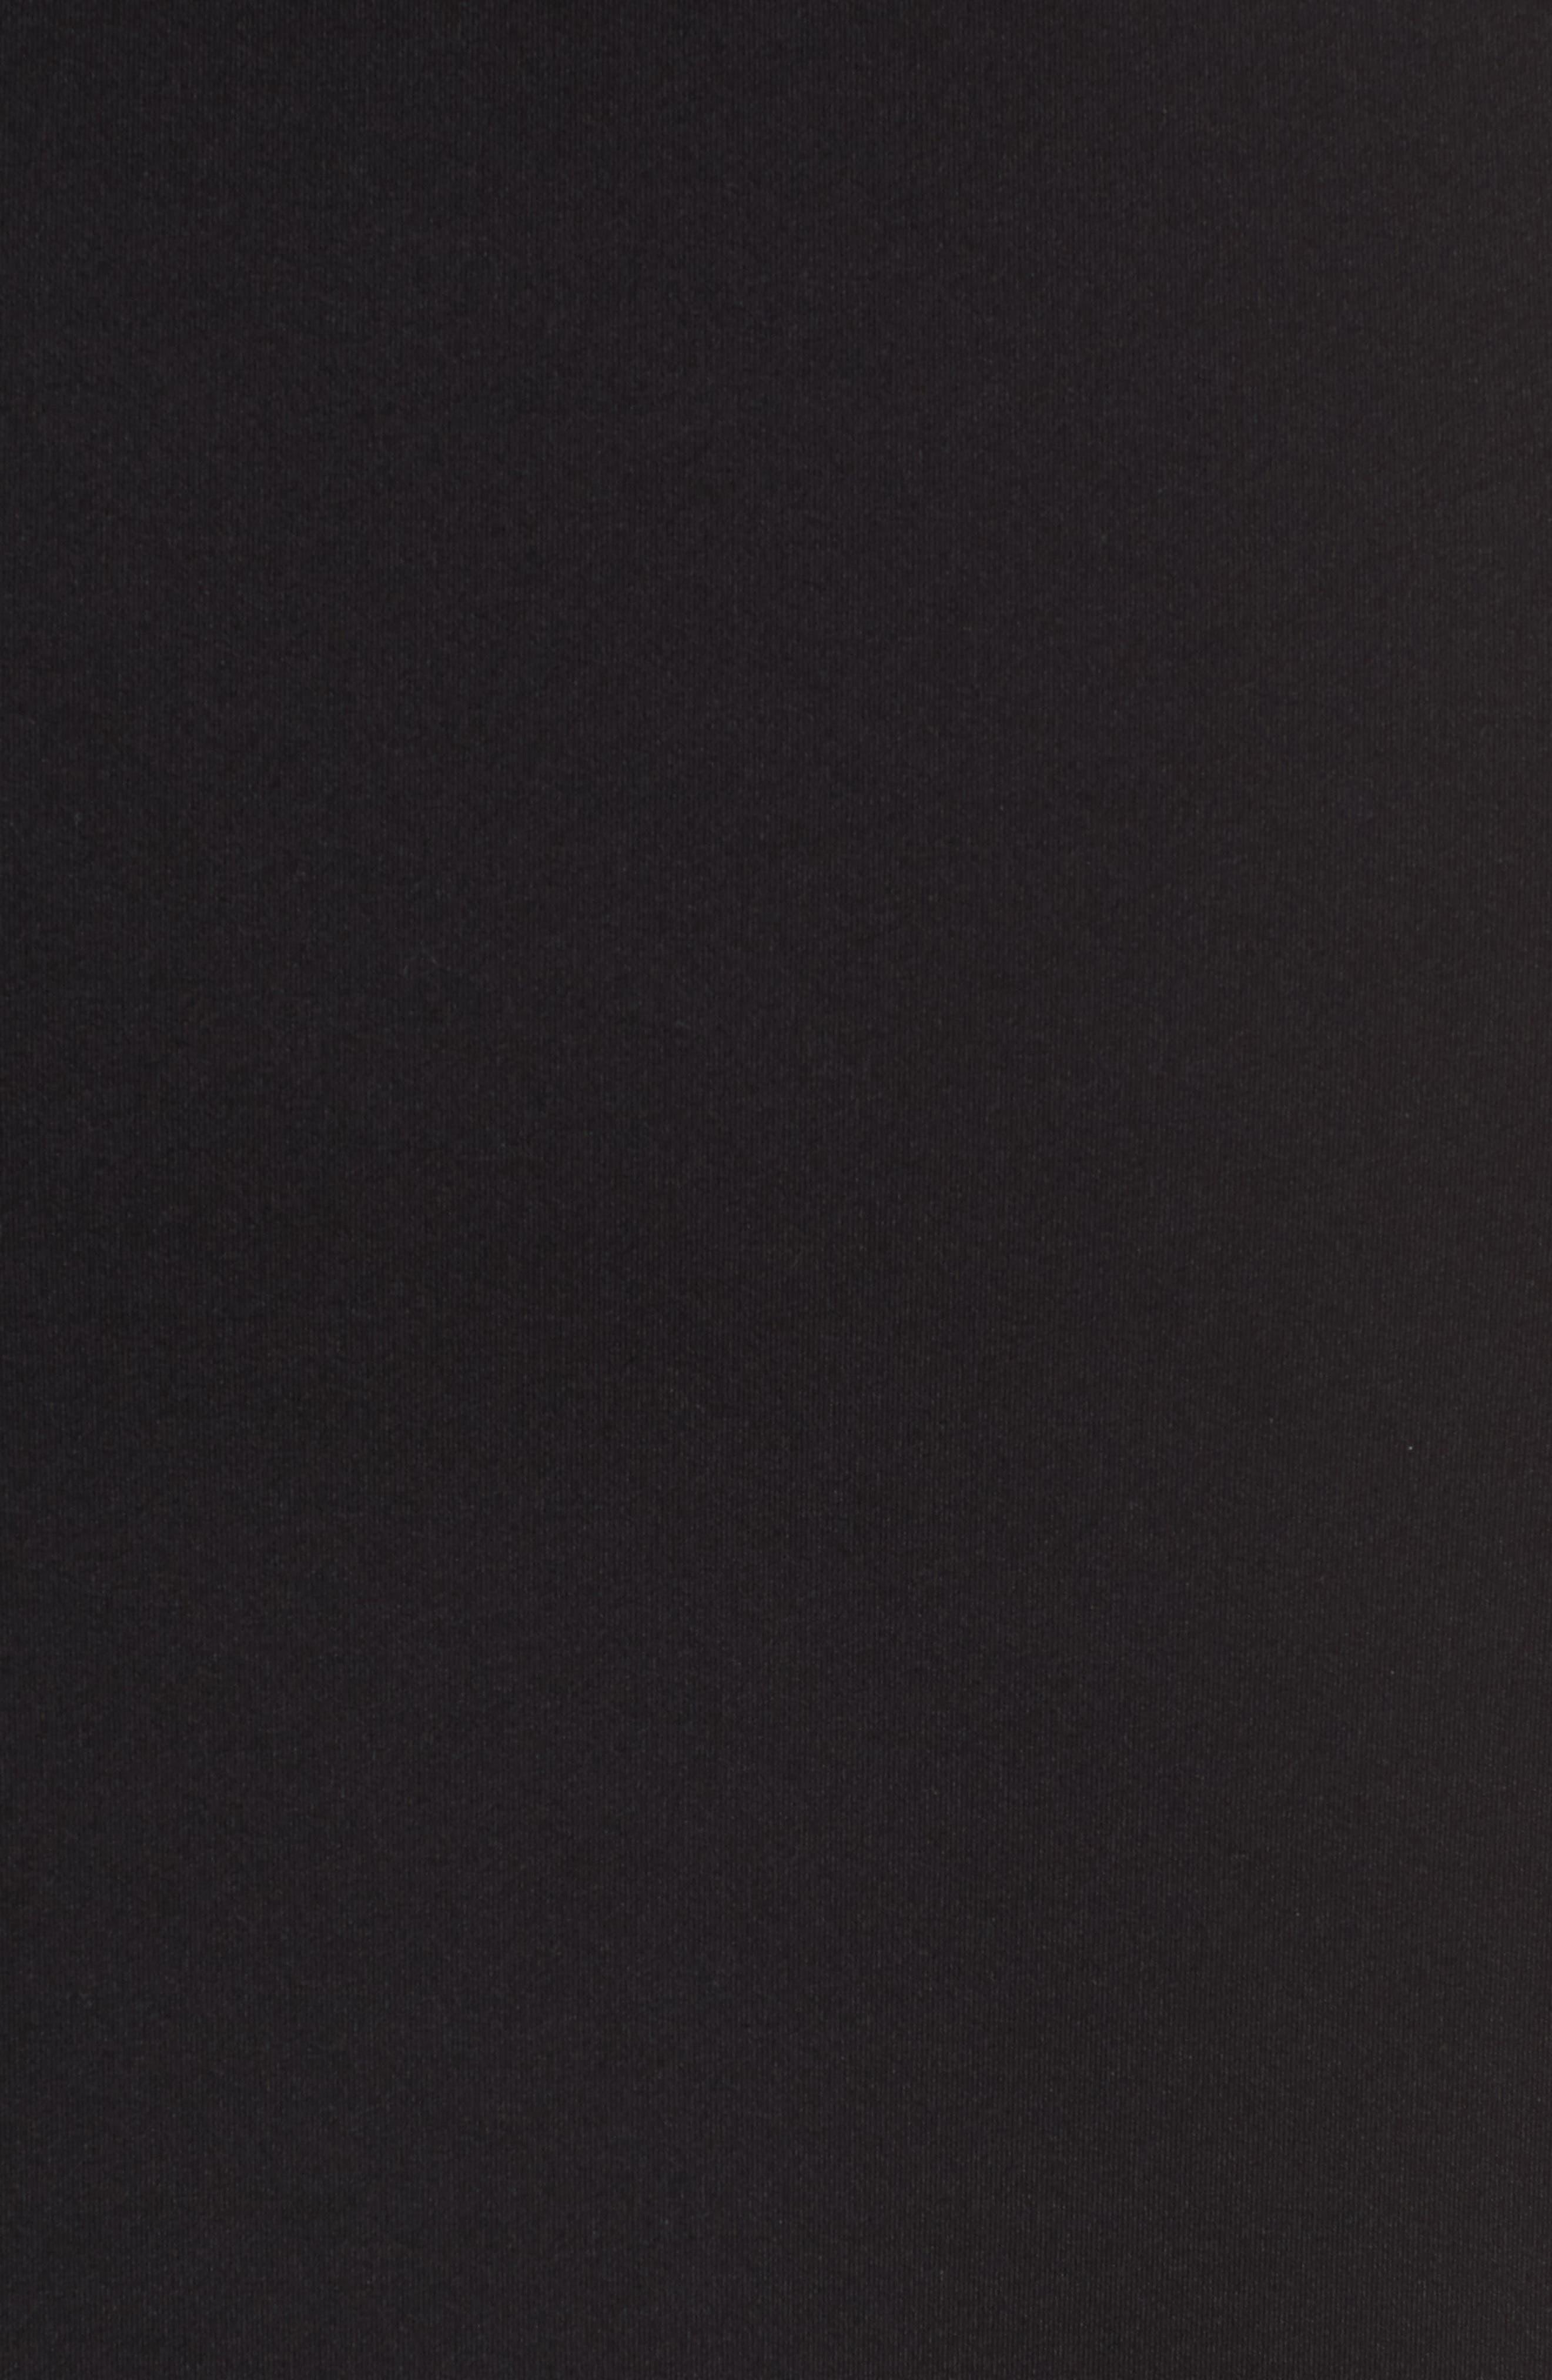 Side Zip Pencil Skirt,                             Alternate thumbnail 6, color,                             Black